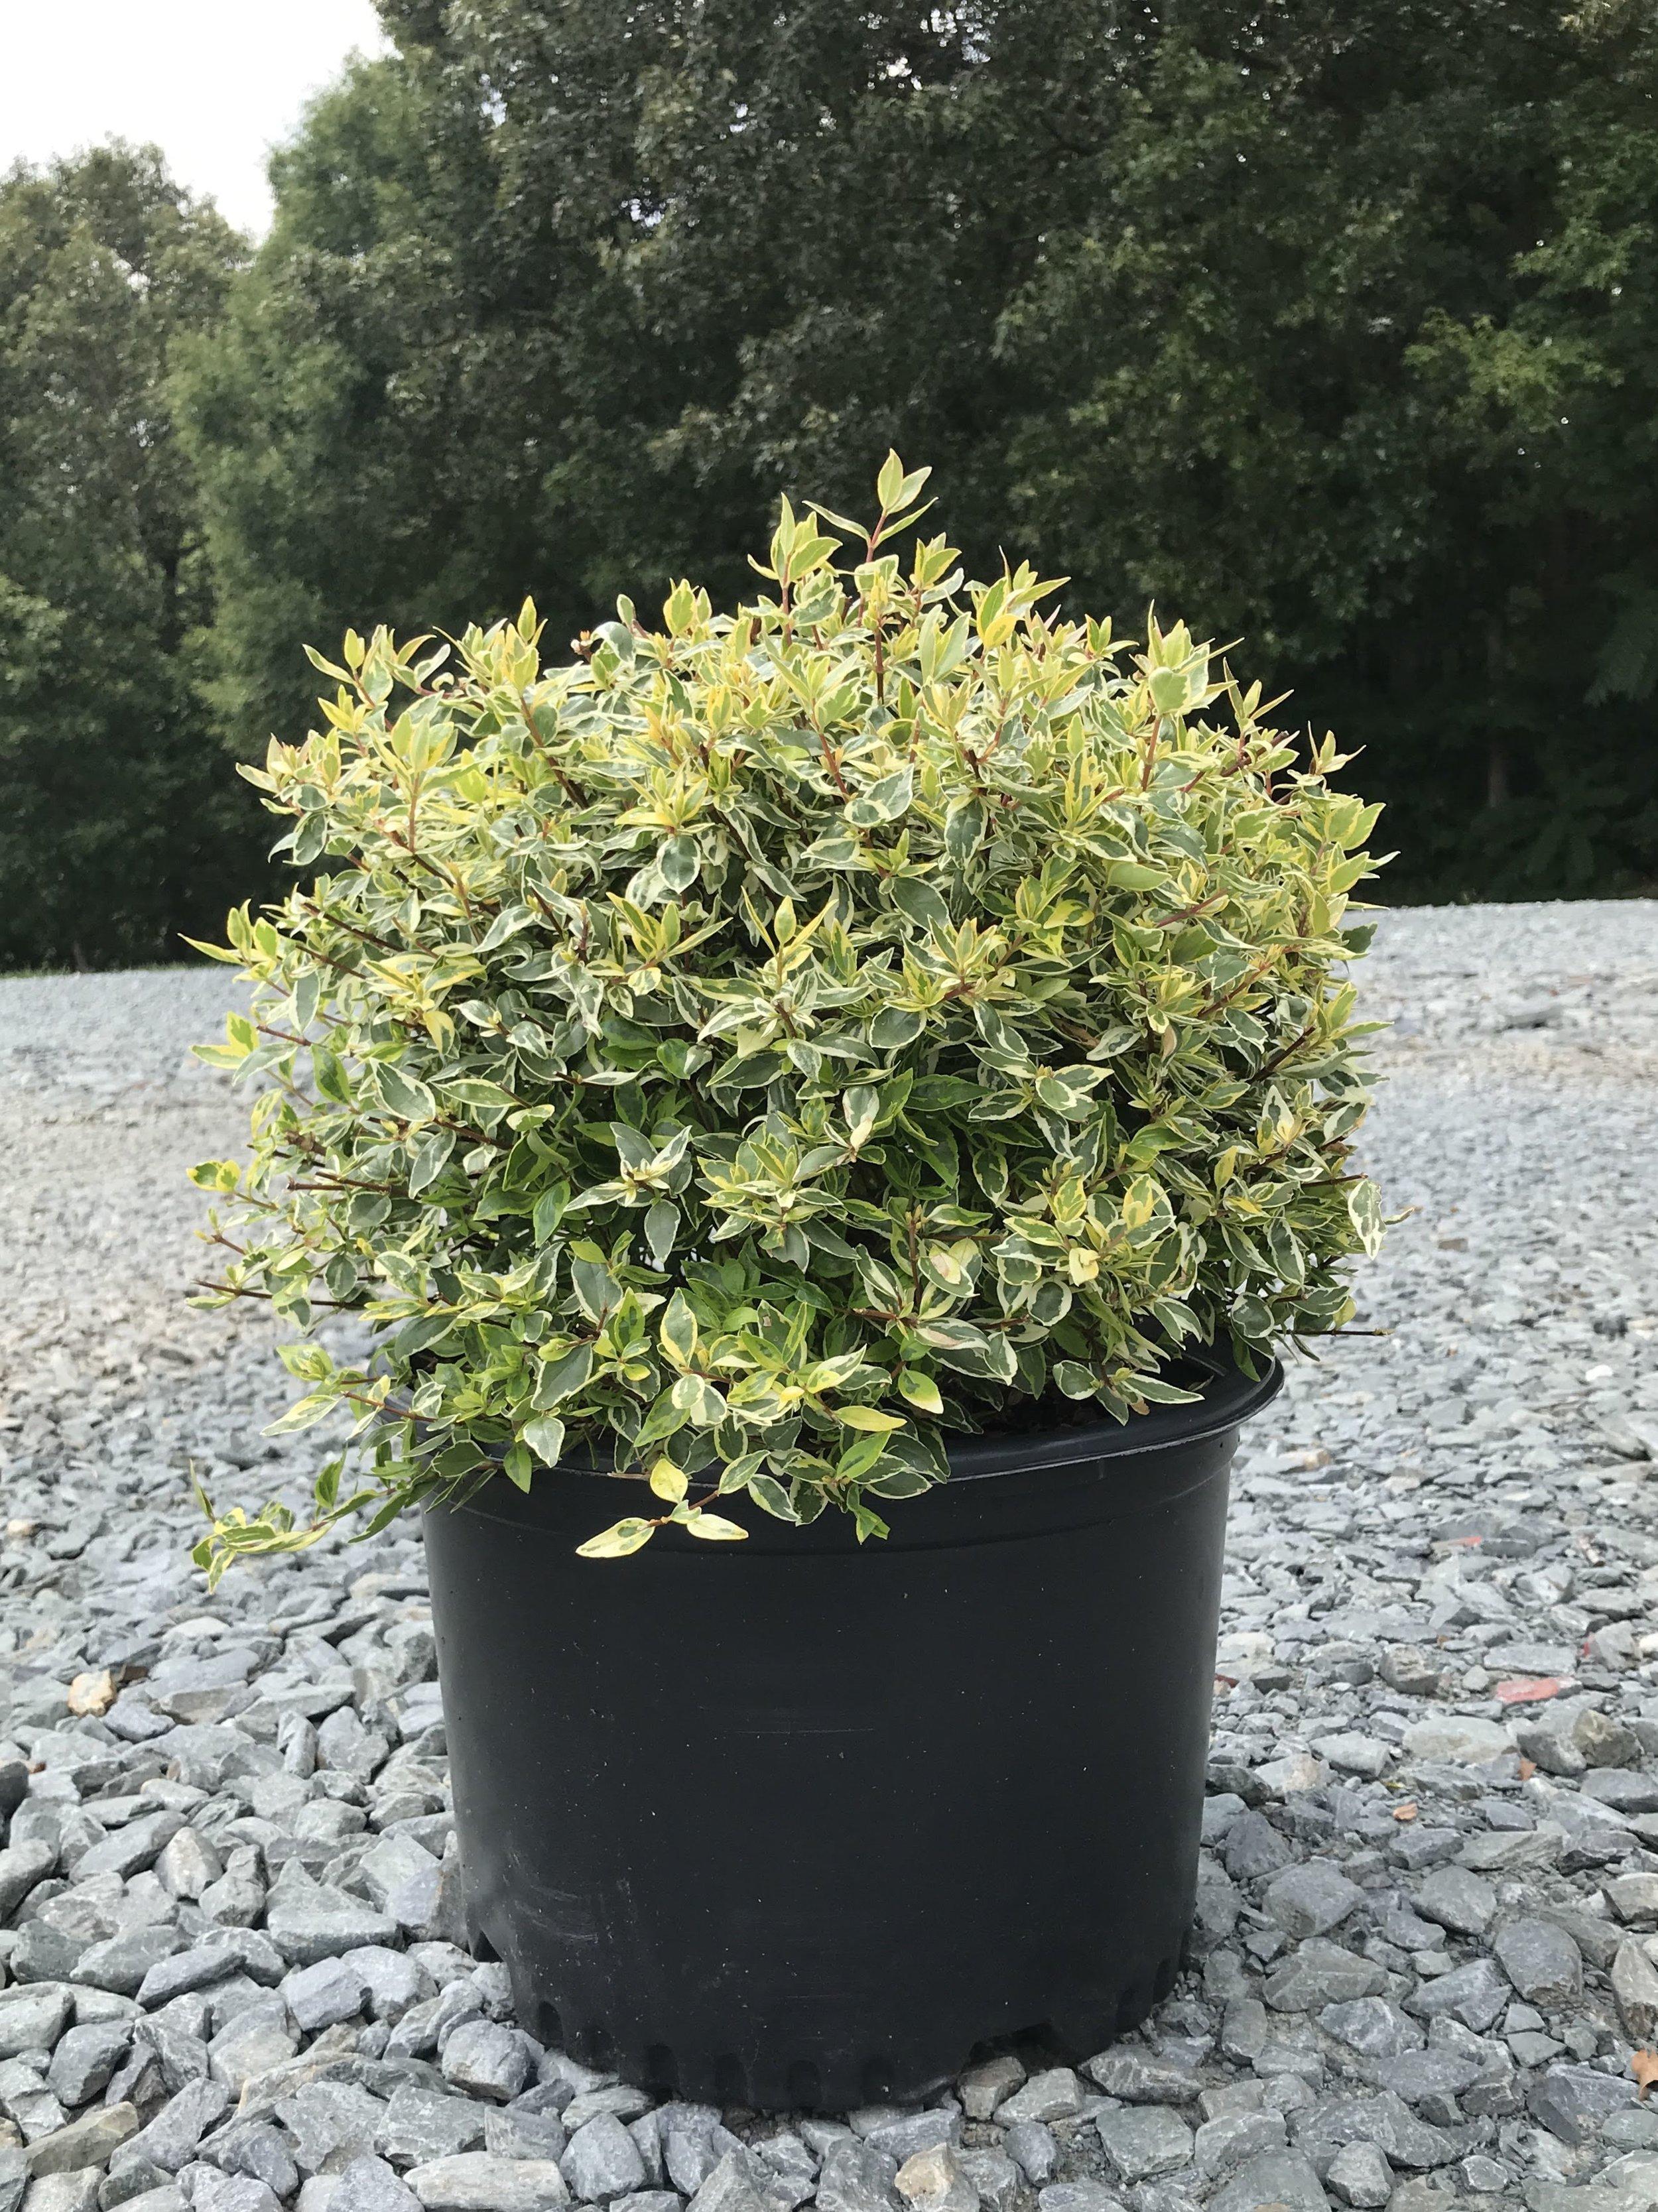 Abelia x grandiflora 'Radiance' 3 gallon